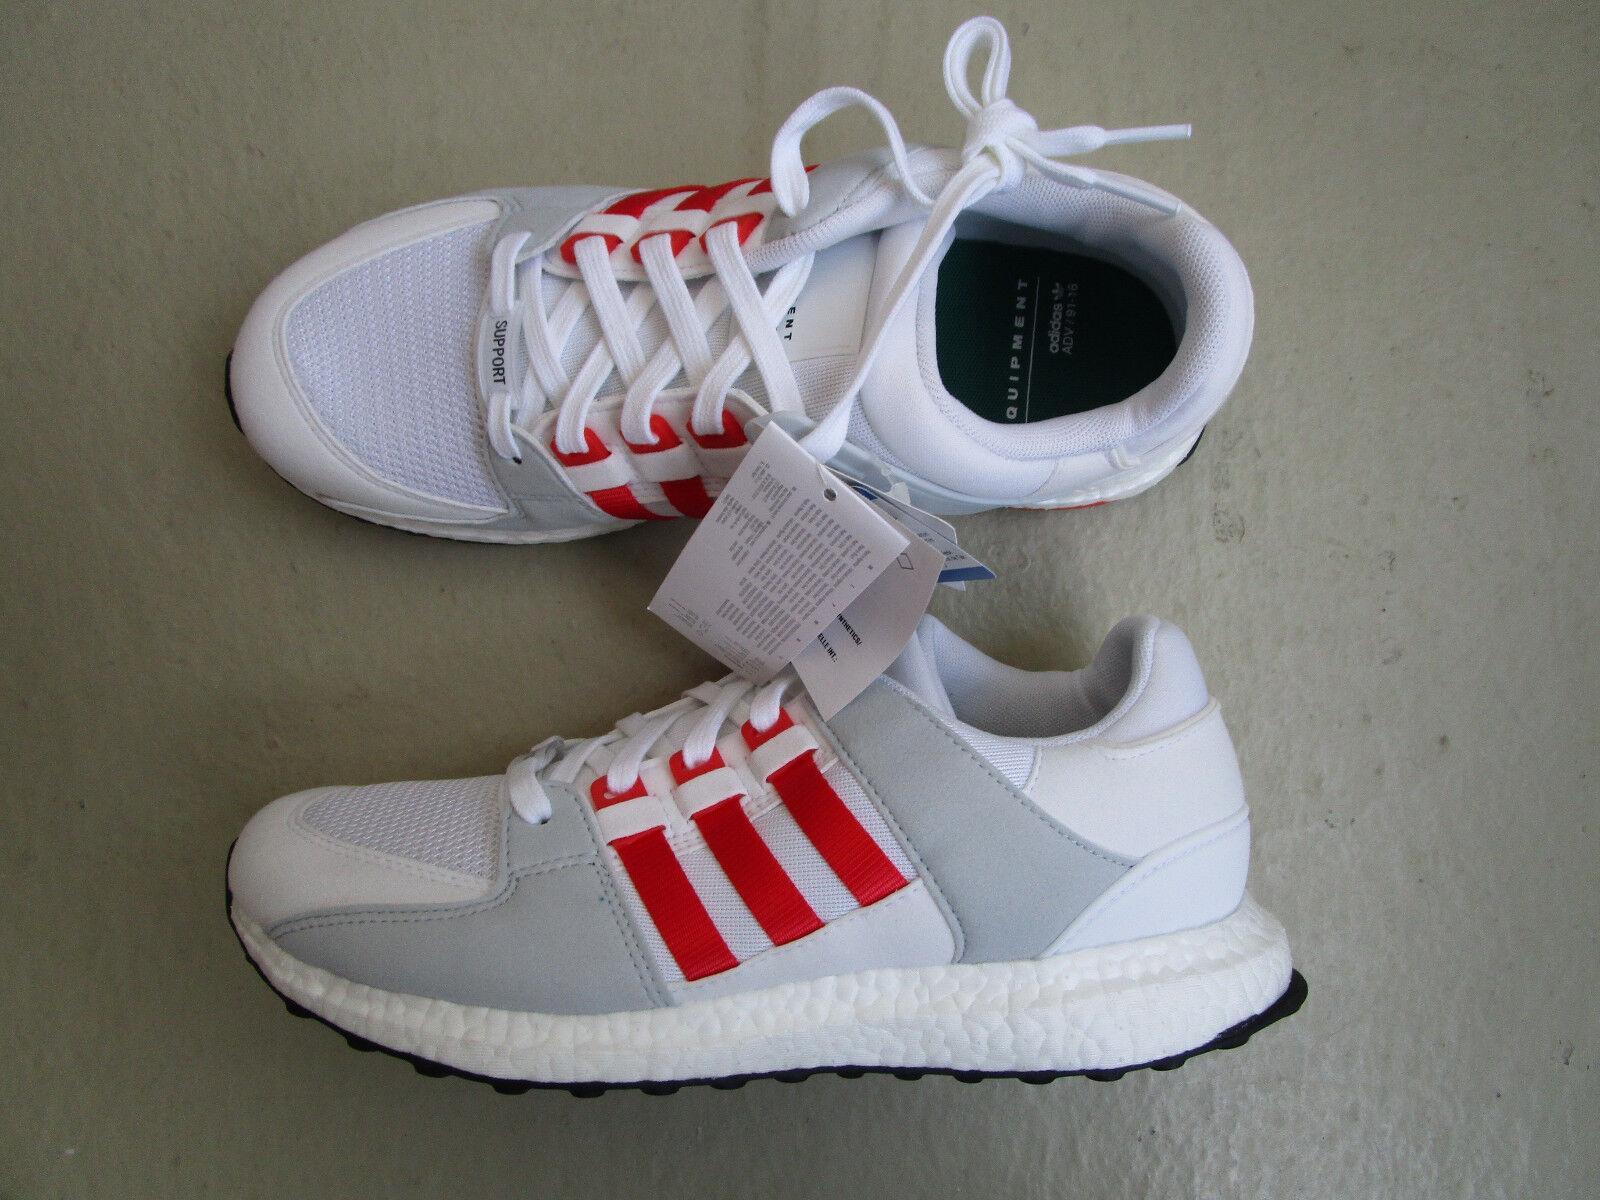 Adidas 42 EQT Equipment Support Ultra OG 42 Adidas Originals White/Orange Bold/Clear Grey ae7c1f